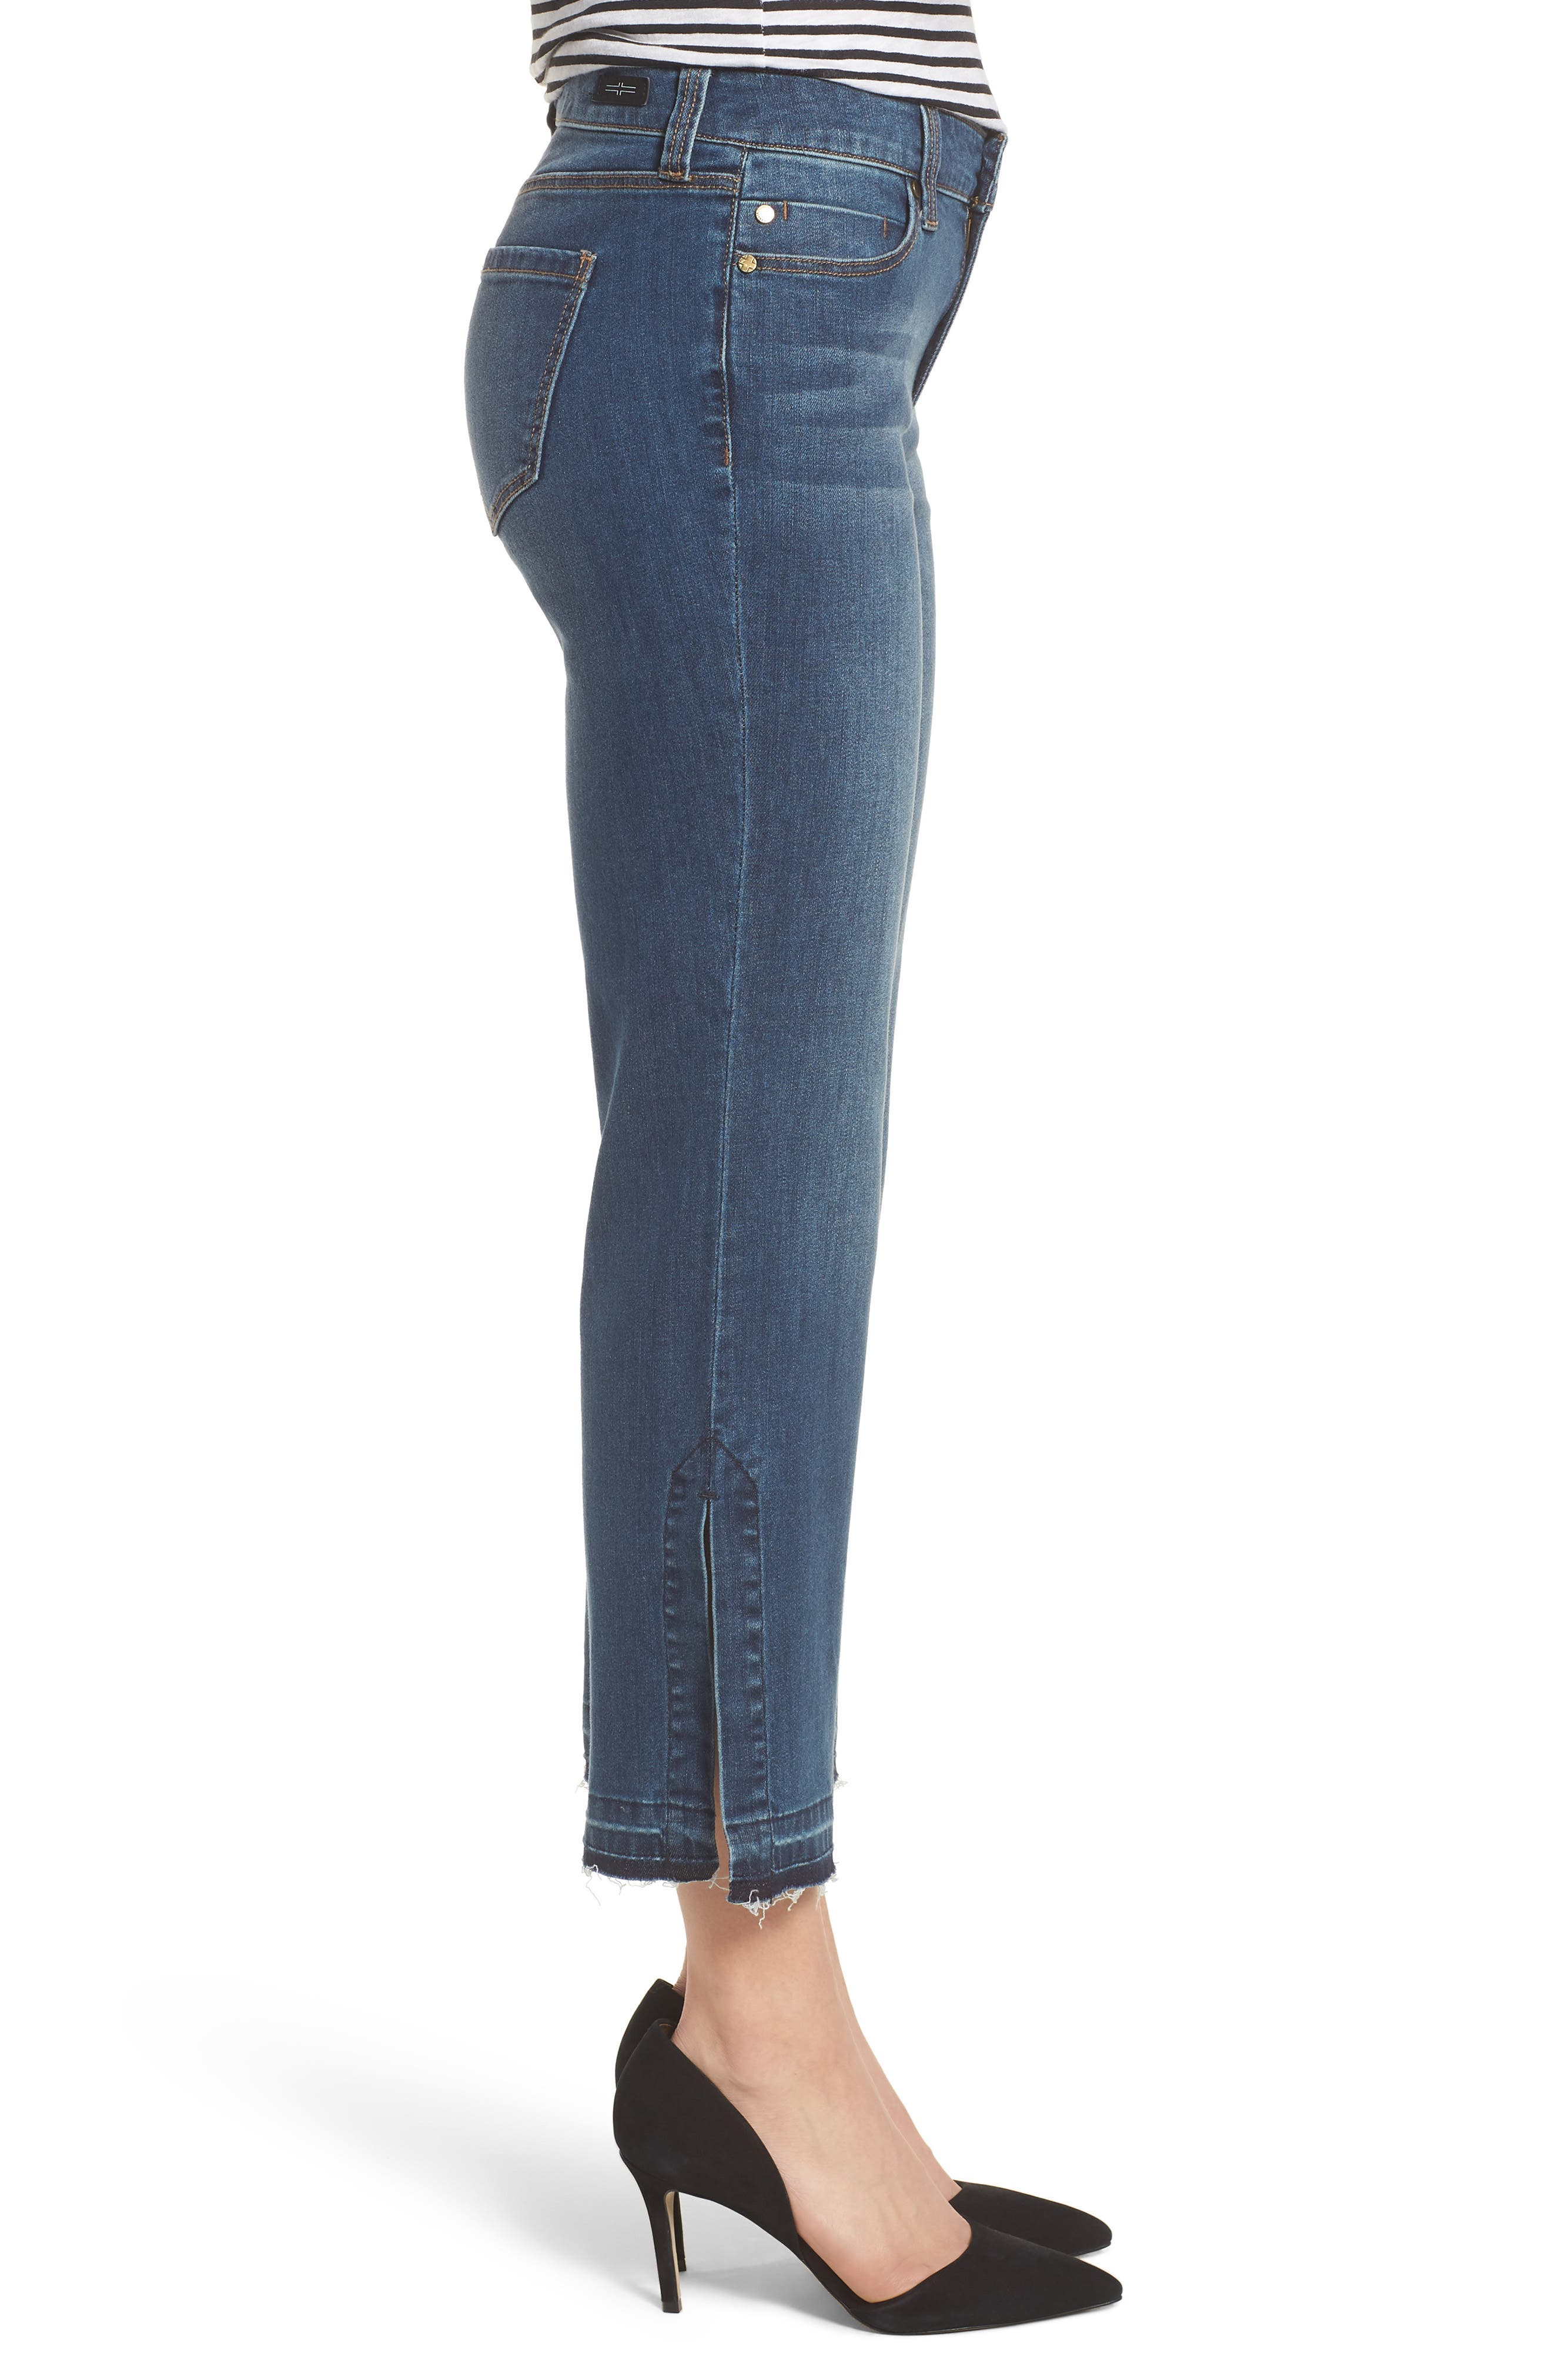 Tabitha Release Hem Crop Jeans,                             Alternate thumbnail 3, color,                             Montauk Mid Blue